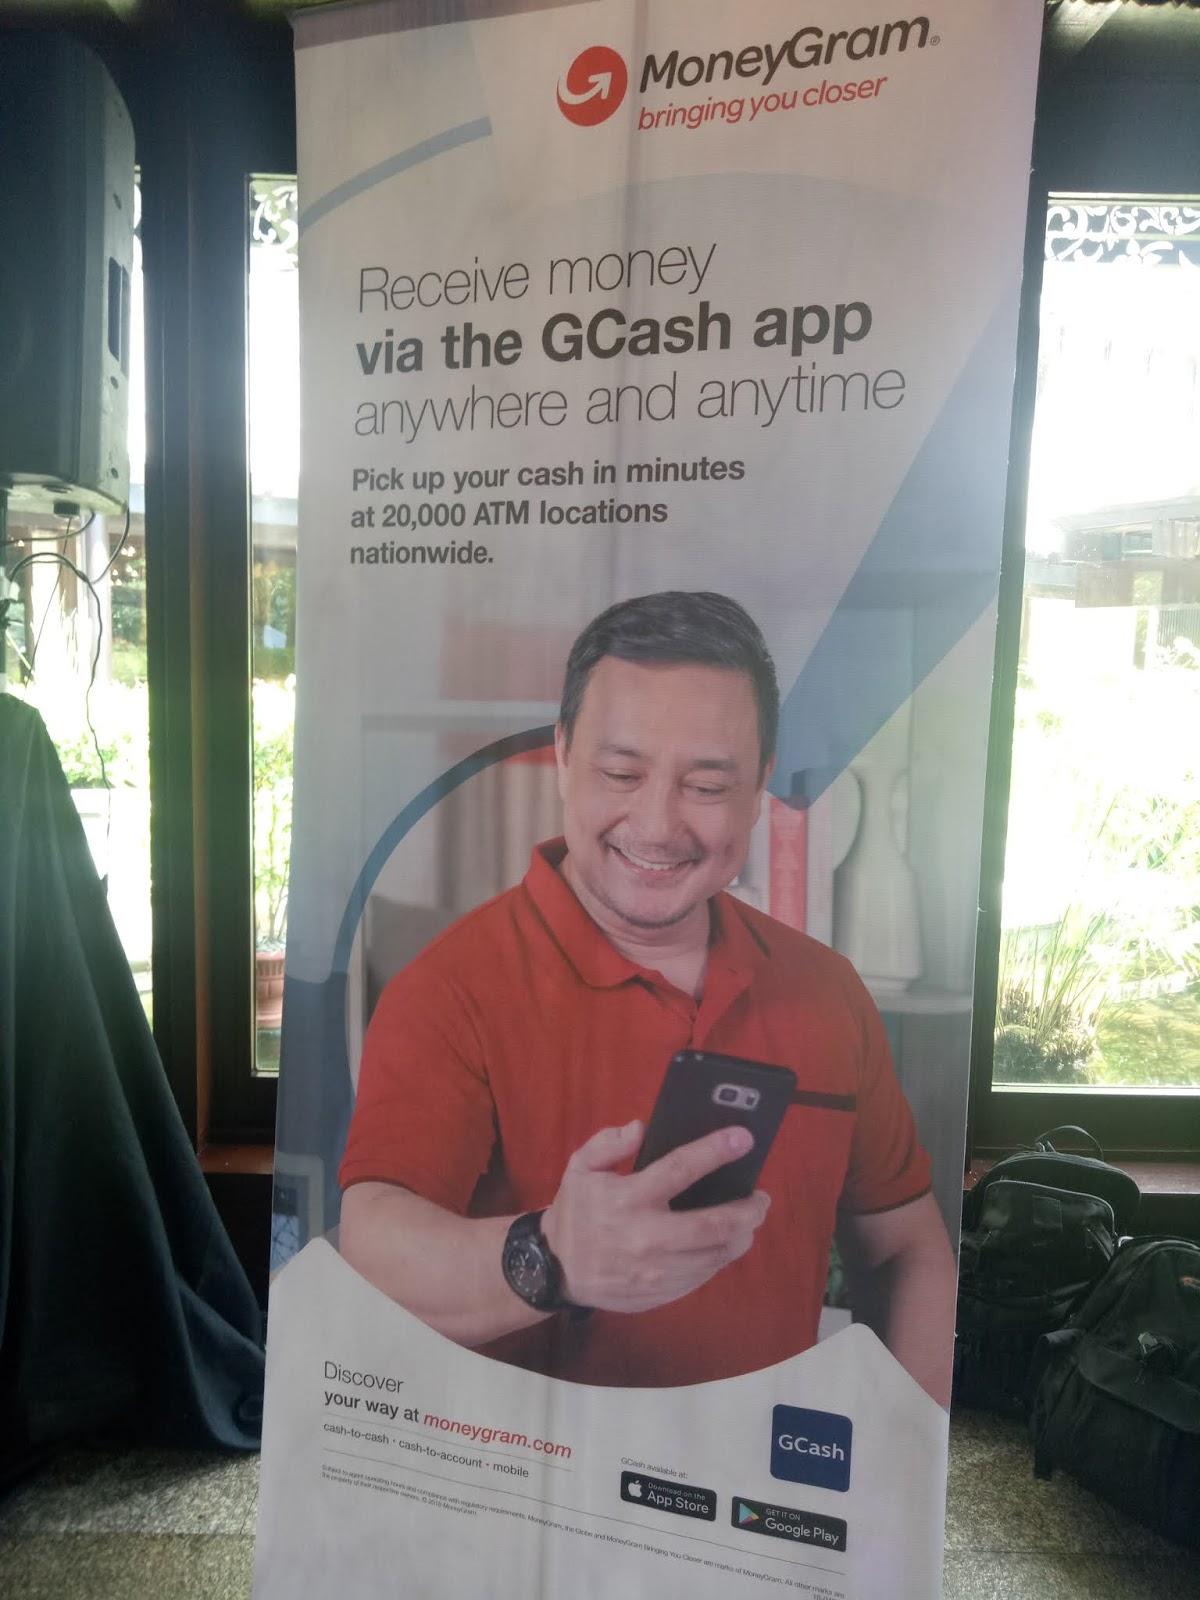 MoneyGram Strengthens Partnership with GCash in the Philippines